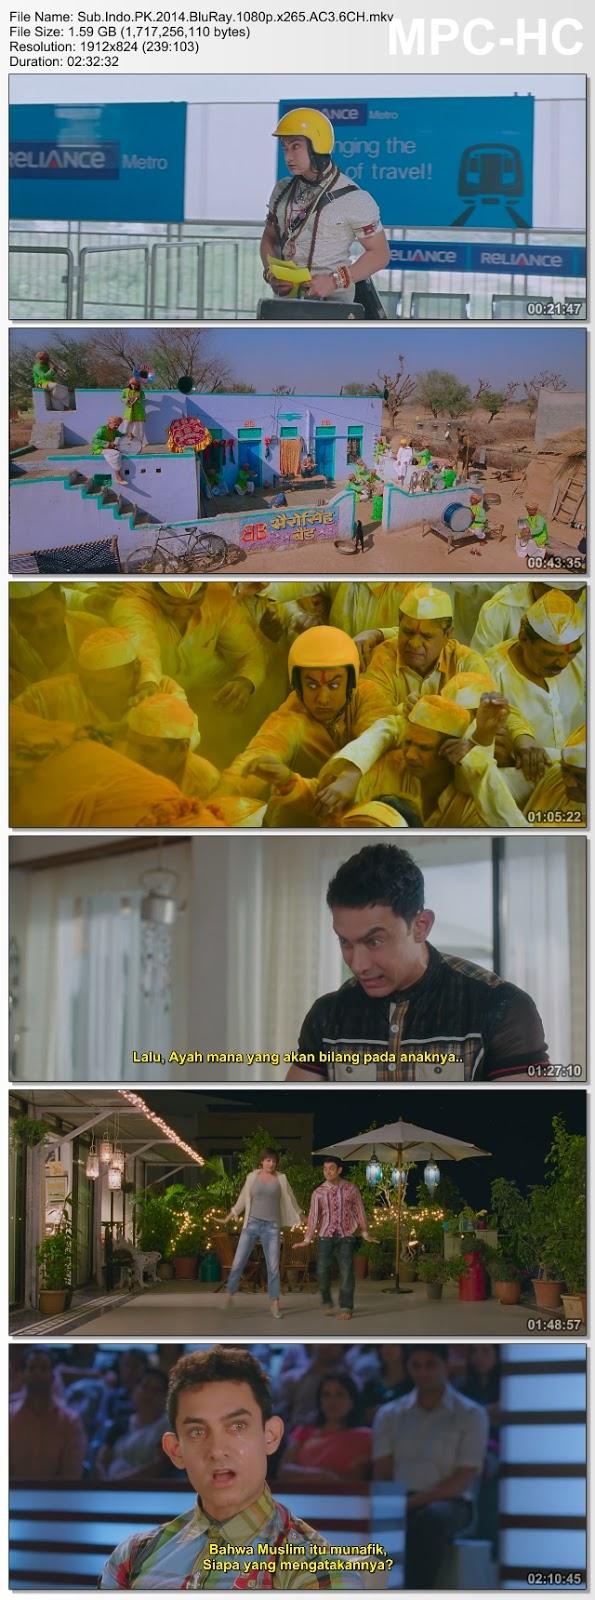 Screenshots Download ПиКей (2014) BluRay 480p & 3GP Subtitle Indonesia